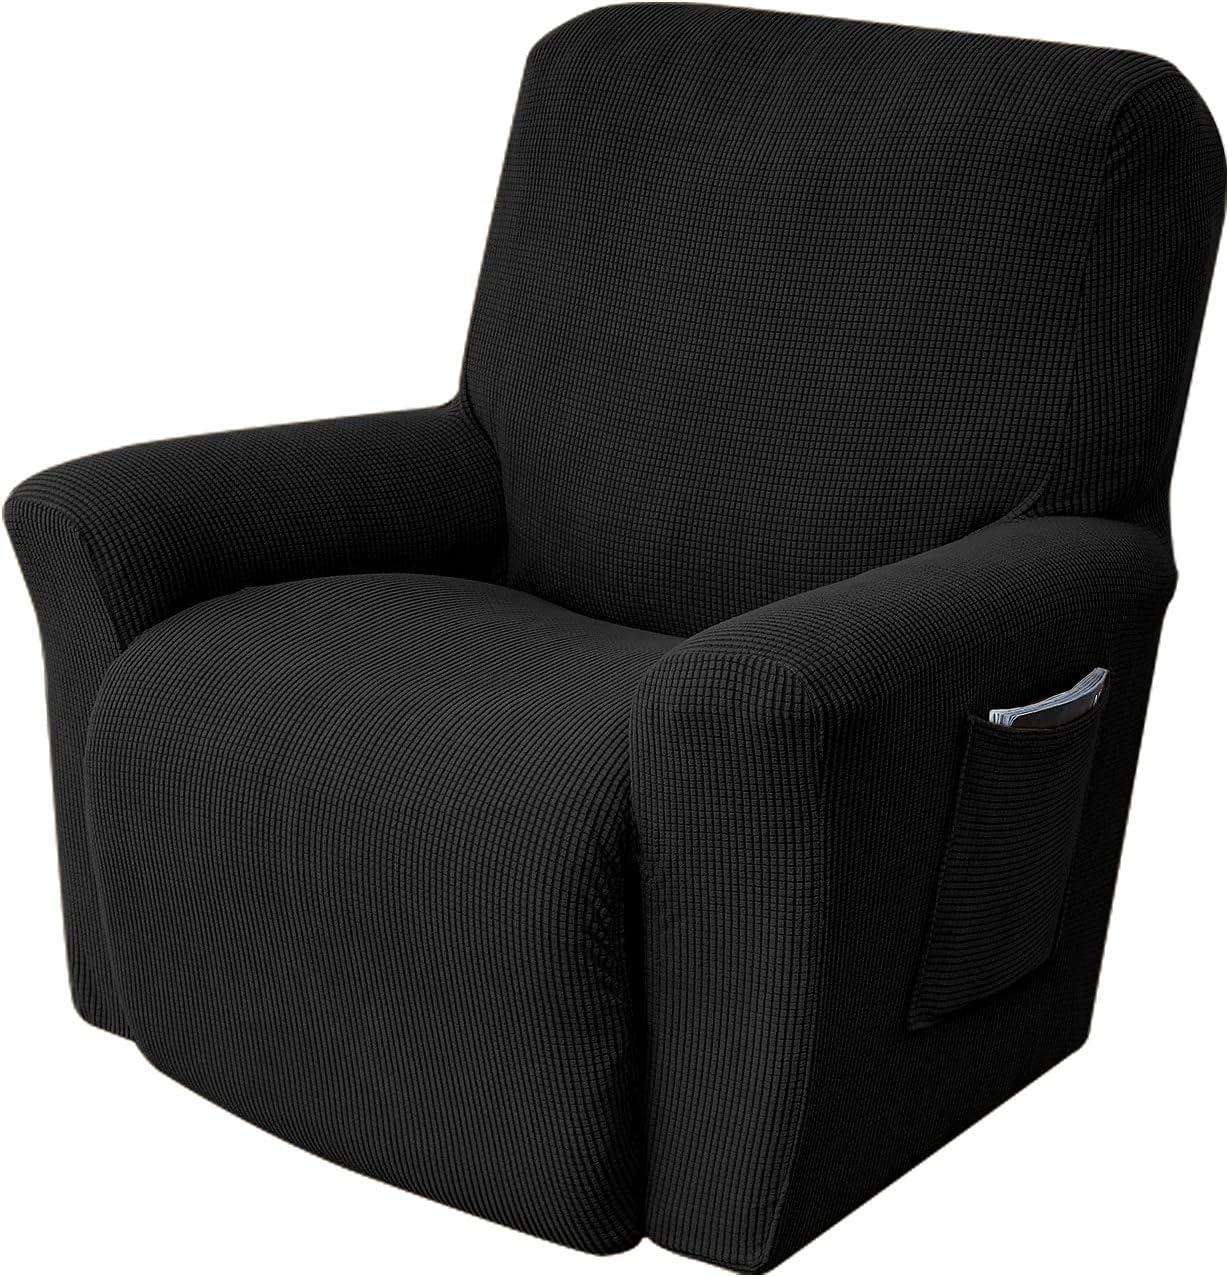 Stretch OFFicial shop Recliner Cover 1-Piece Soft Seat Sofa Single Sacramento Mall Couc